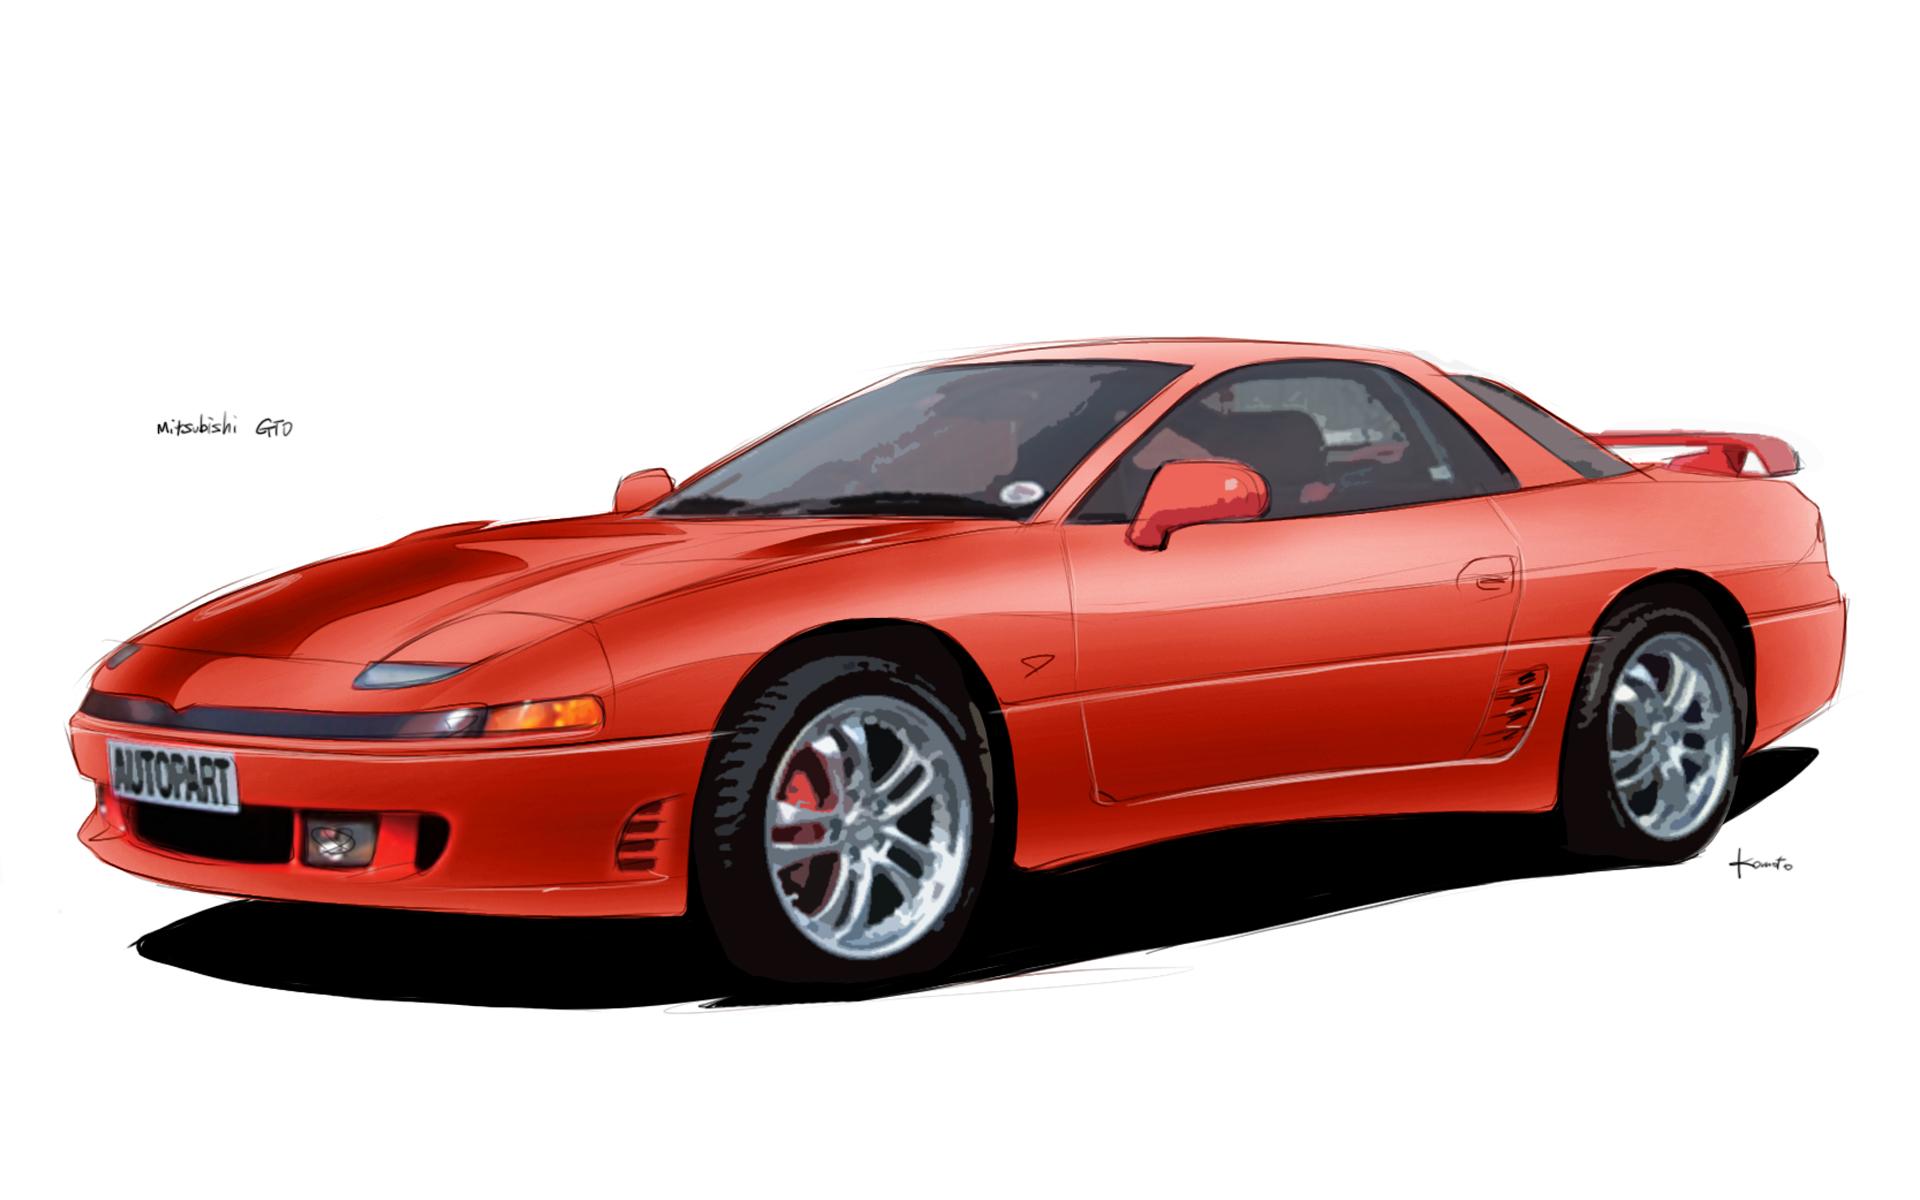 2018 Mitsubishi Gto >> 三菱 GTO(MITSUBISHI GTO)フリーイラスト素材(無料・商用利用可) - 車検費用110番 - 安い車検をおすすめ比較